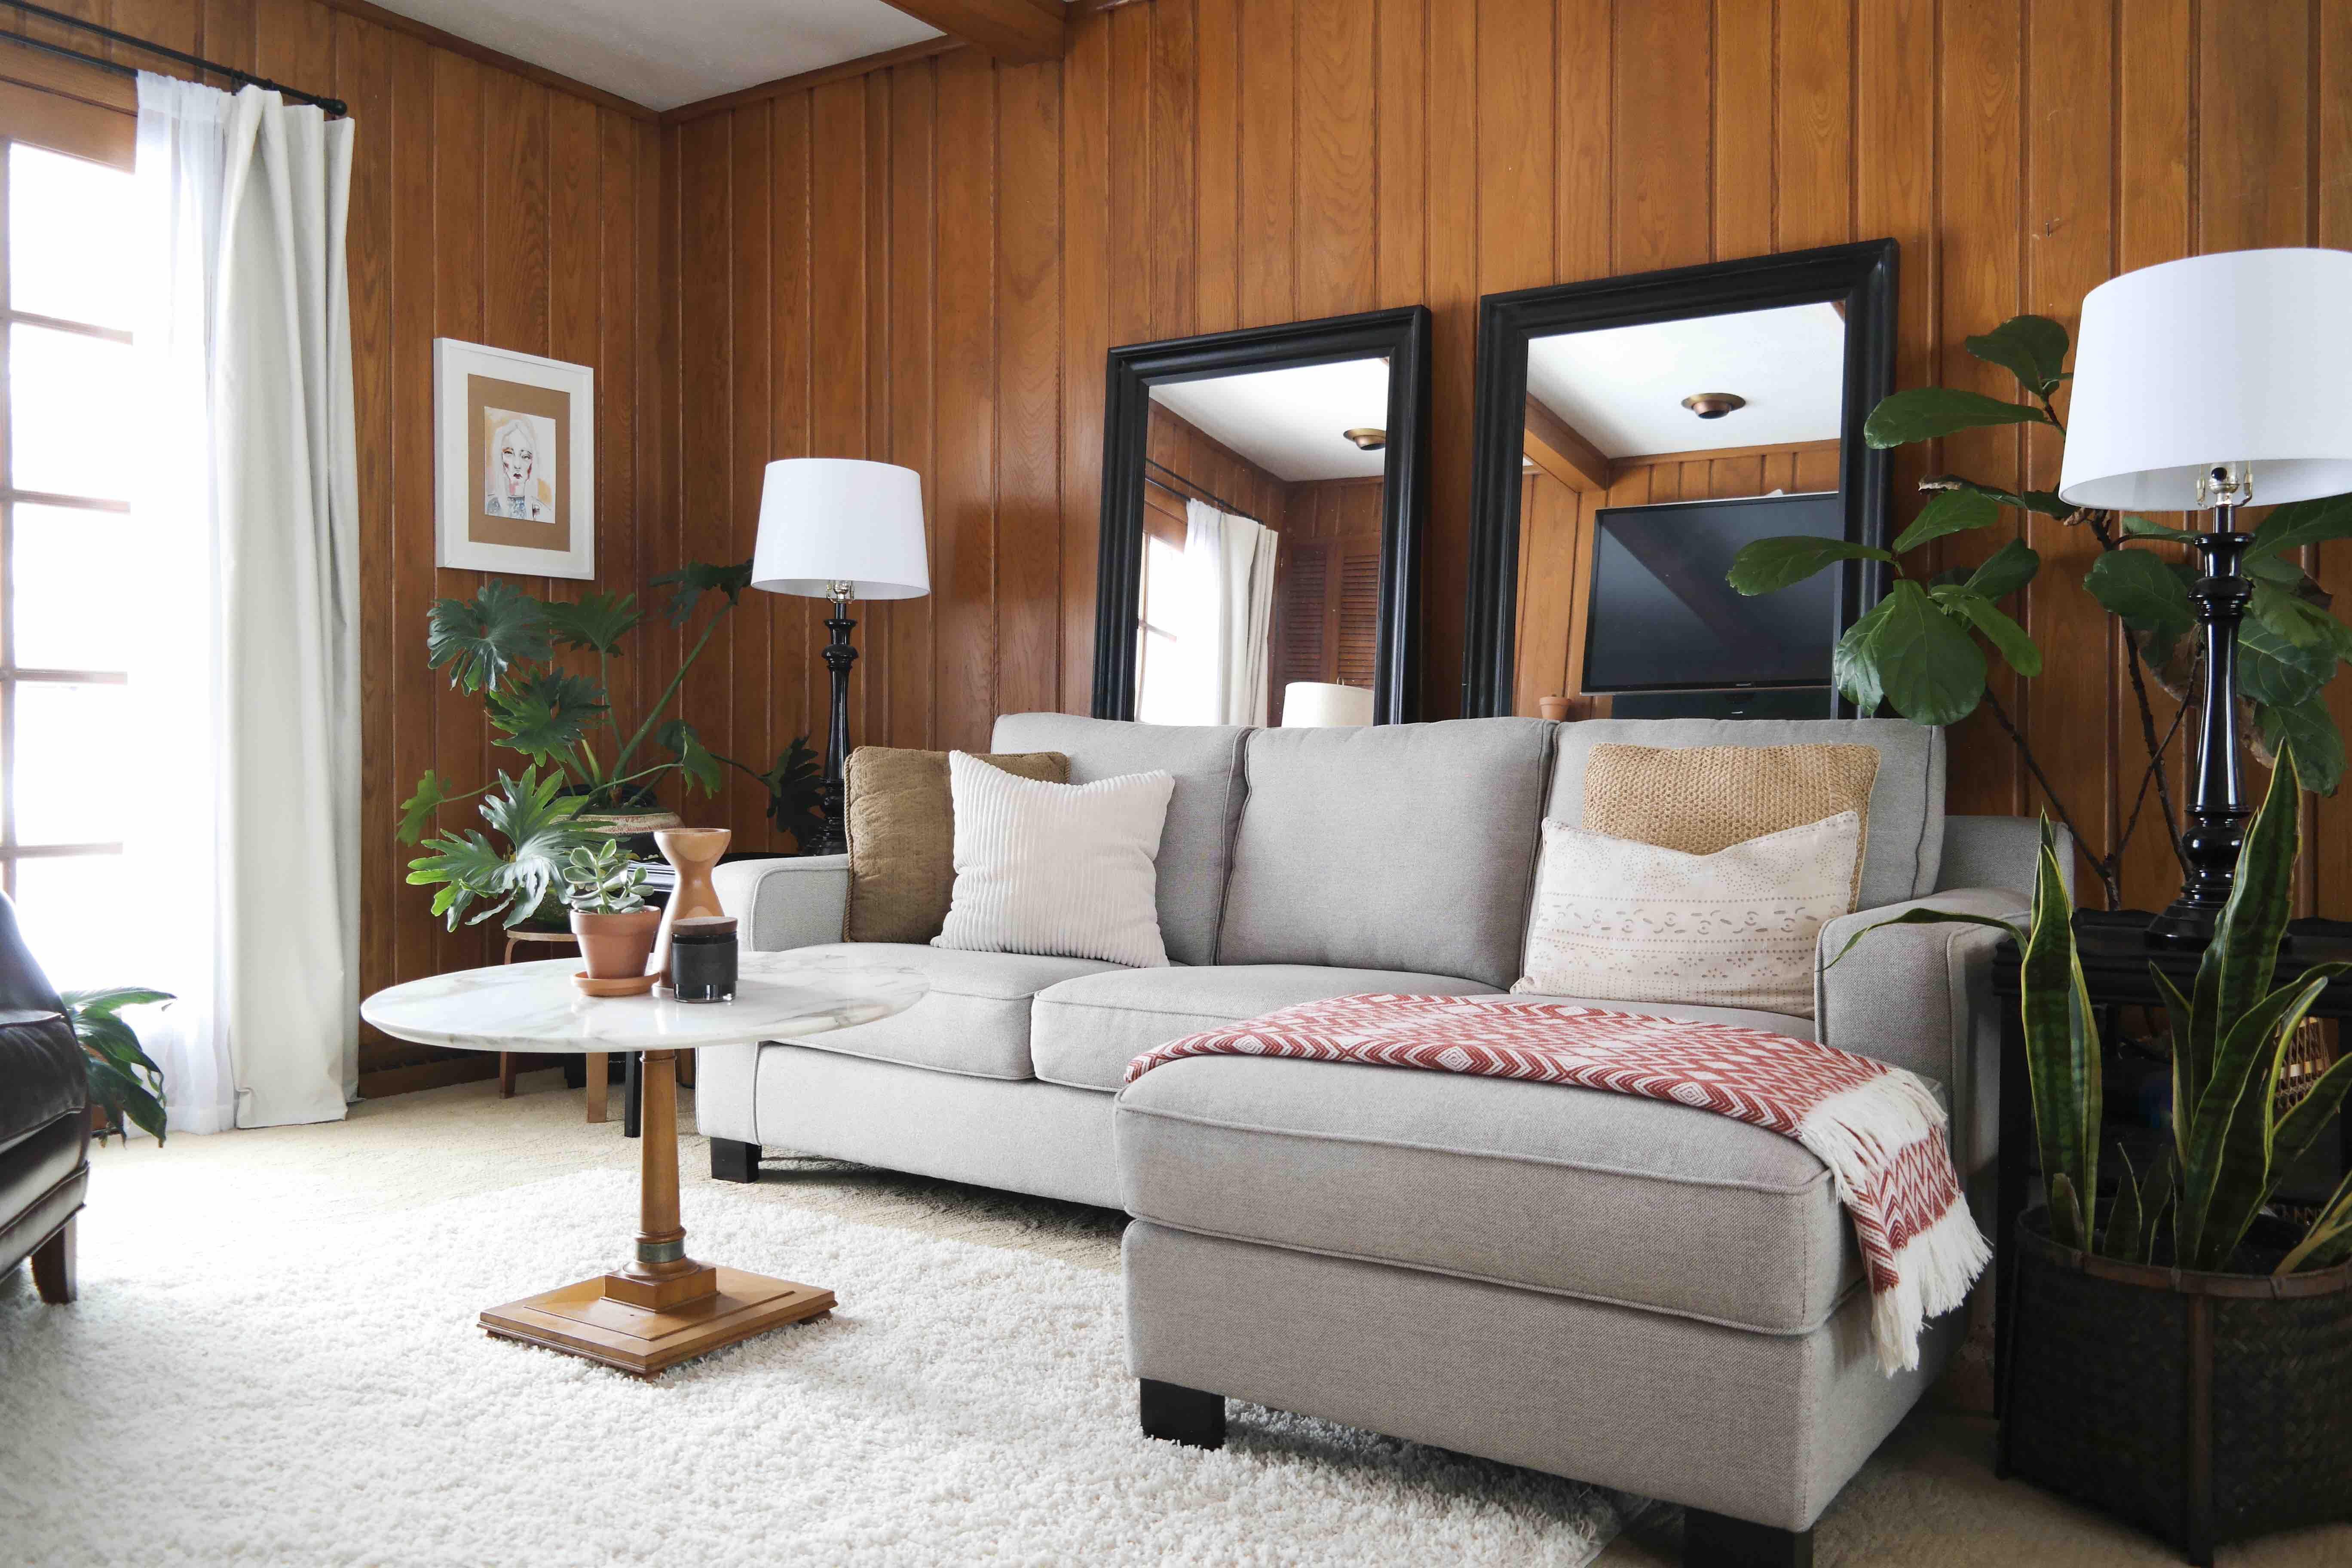 Vintage house interior design susieus house tour represents great interior design inspiration as